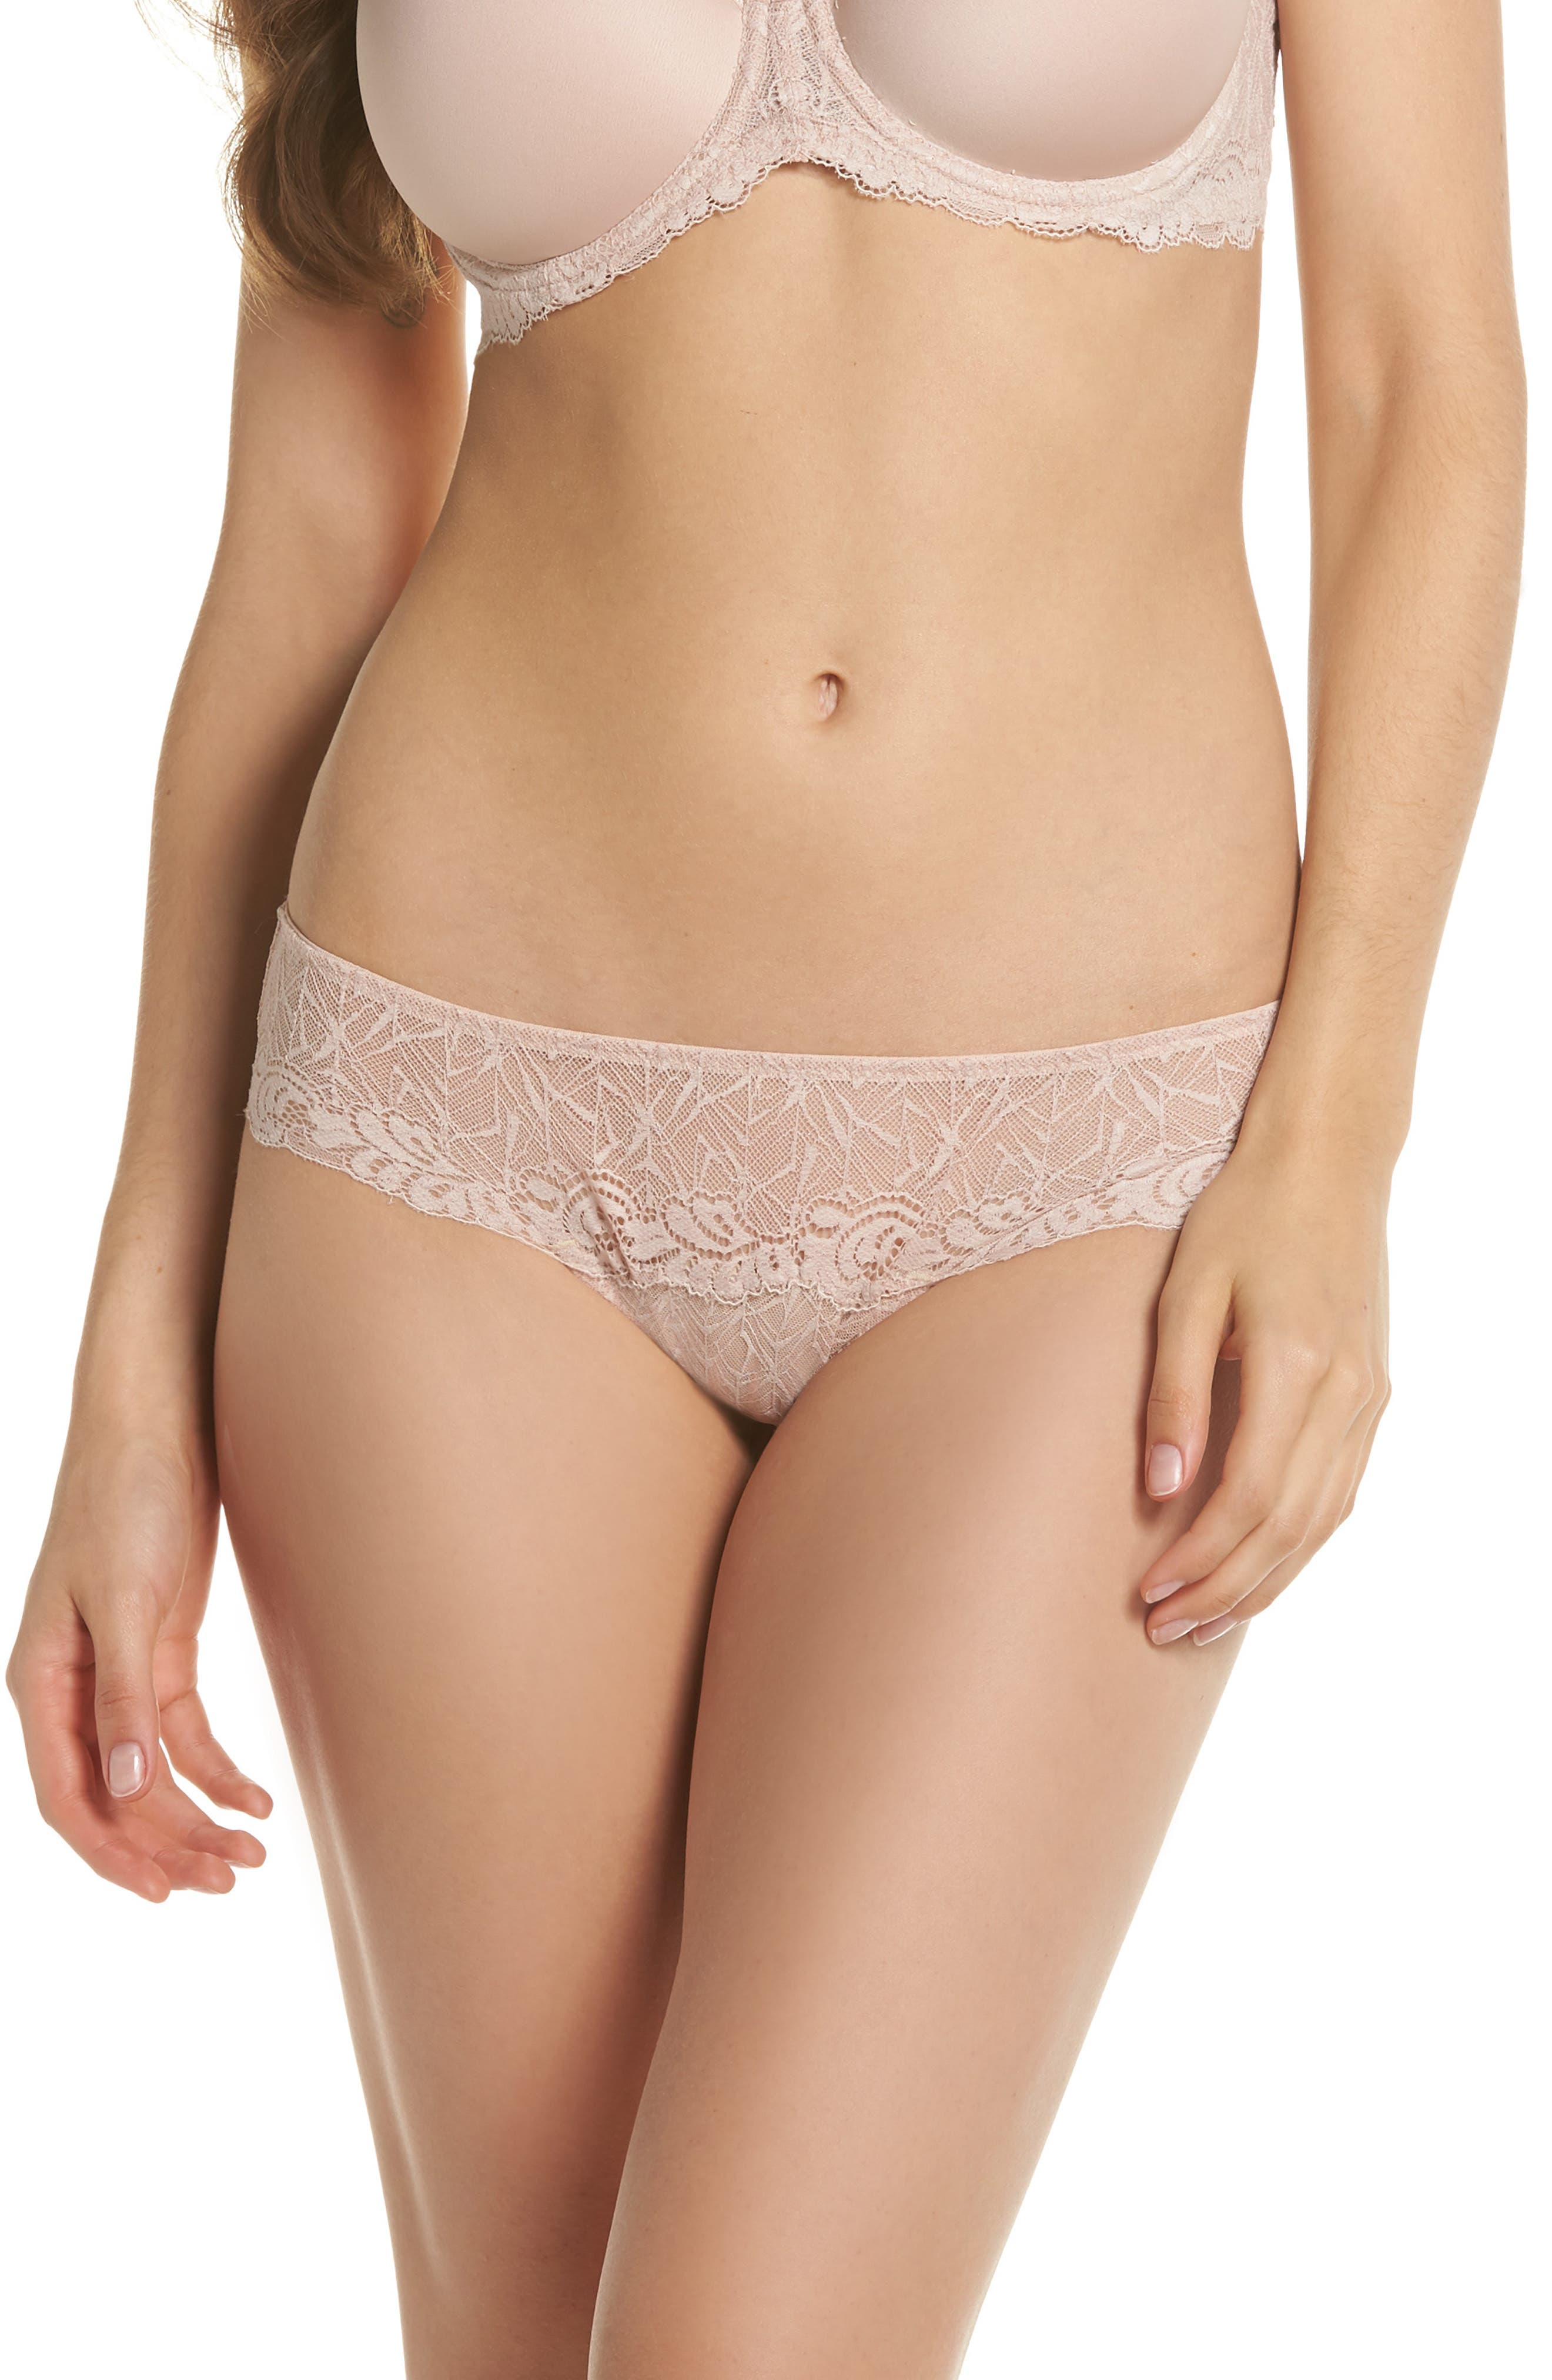 Vivid Encounter Lace Bikini,                         Main,                         color, Rose Dust